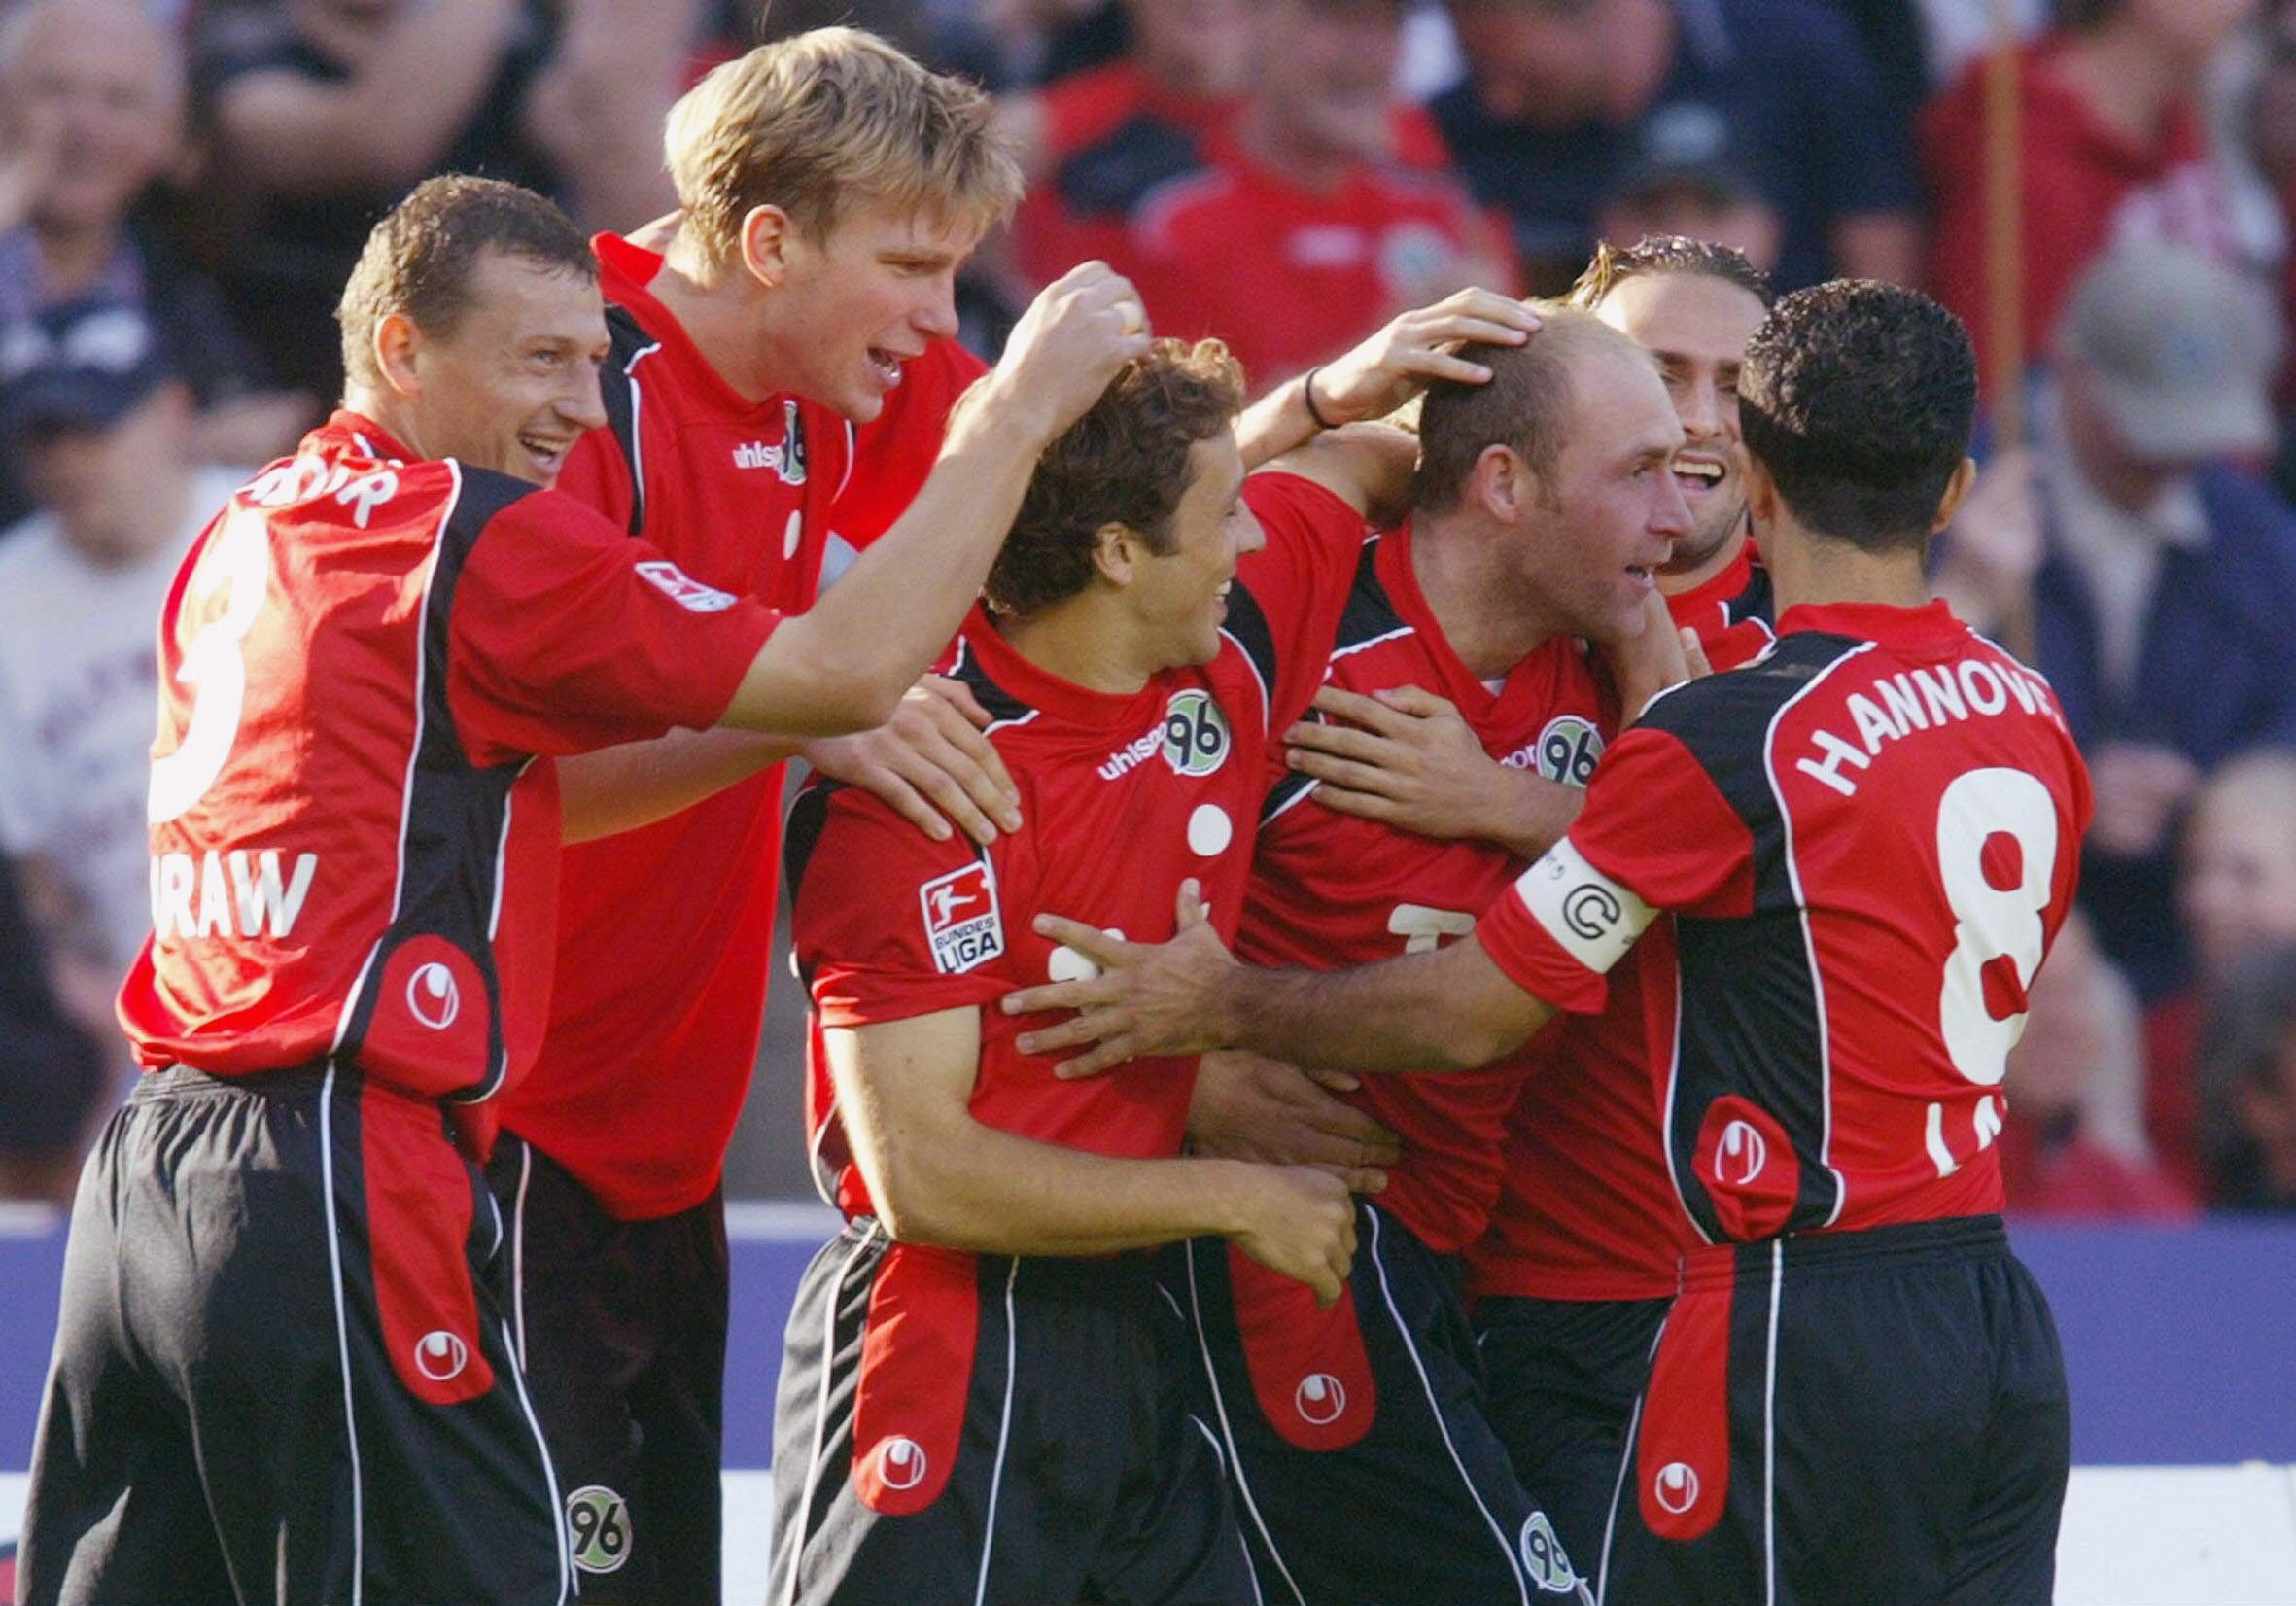 FB: 1. Bundesliga 04/05, Hannover 96-SC Freiburg